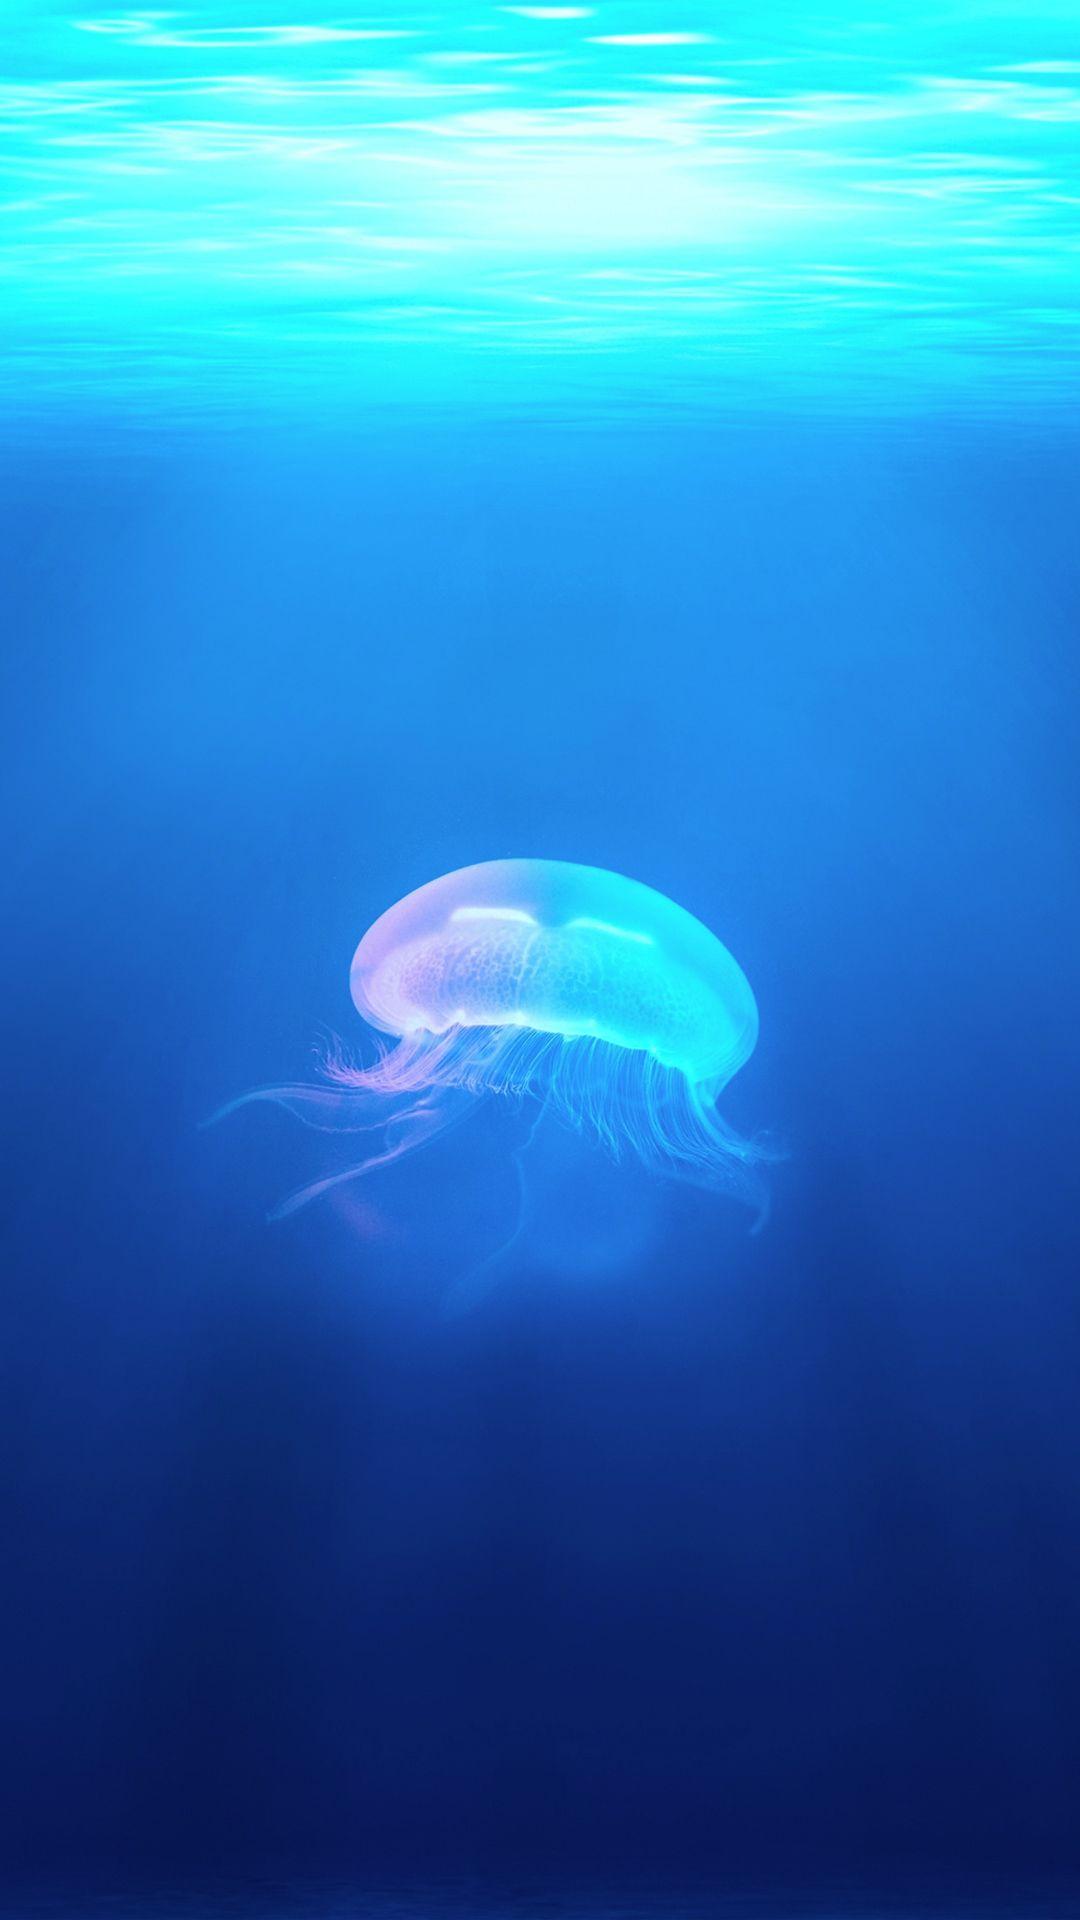 Ocean Jellyfish Surreal Light Iphone 8 Wallpapers Jellyfish